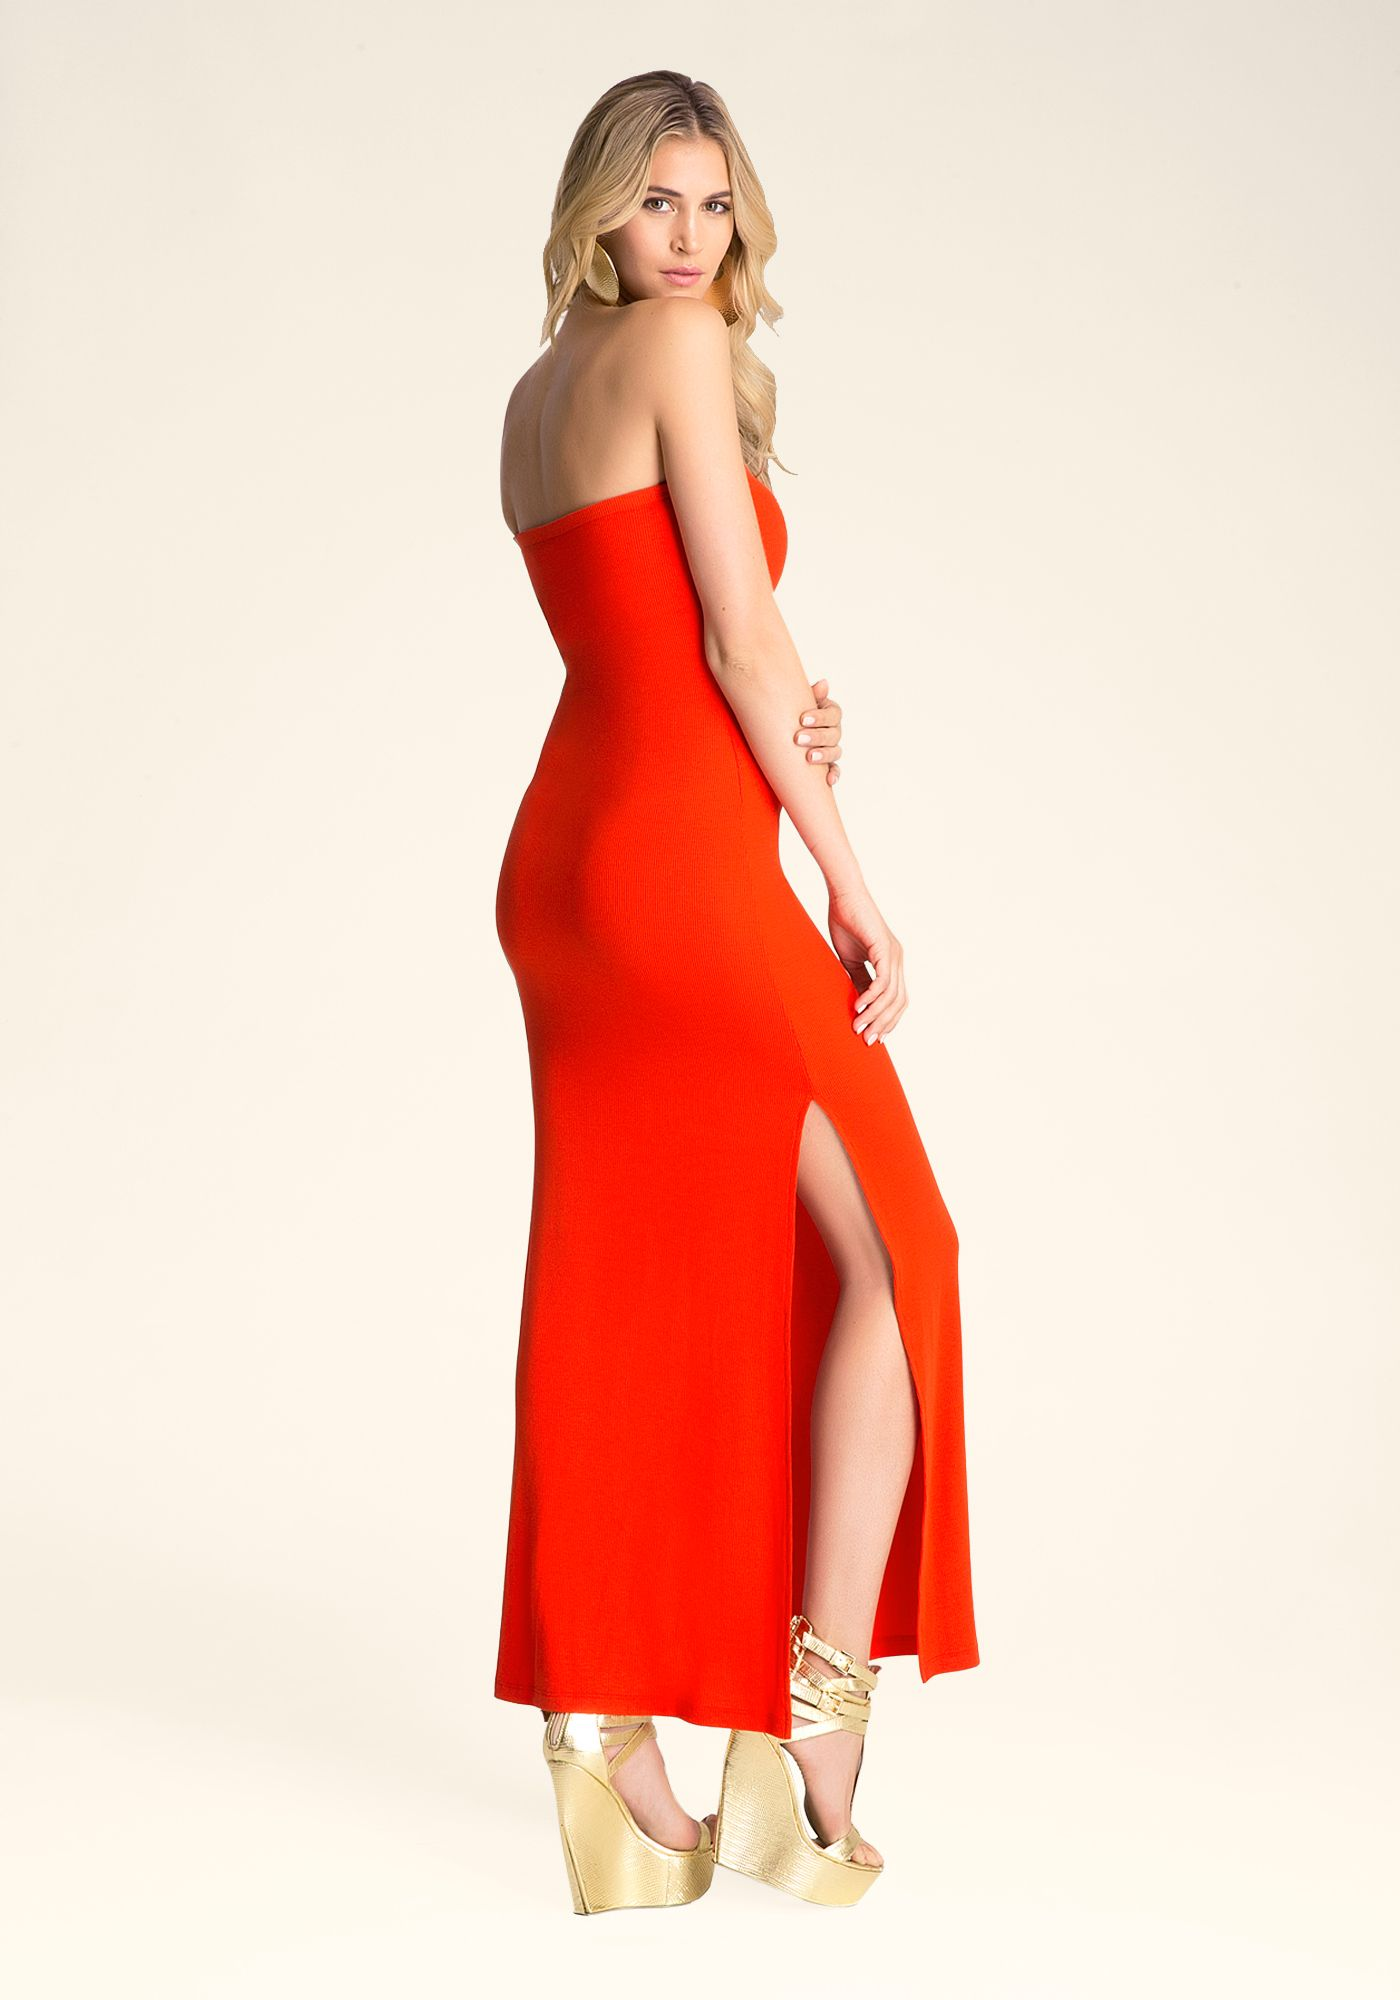 Bebe Logo Jersey Tube Maxi Dress Tayler Rose 221986 Fff Tube Maxi Dresses Strapless Dress Formal Maxi Dress [ 2000 x 1400 Pixel ]